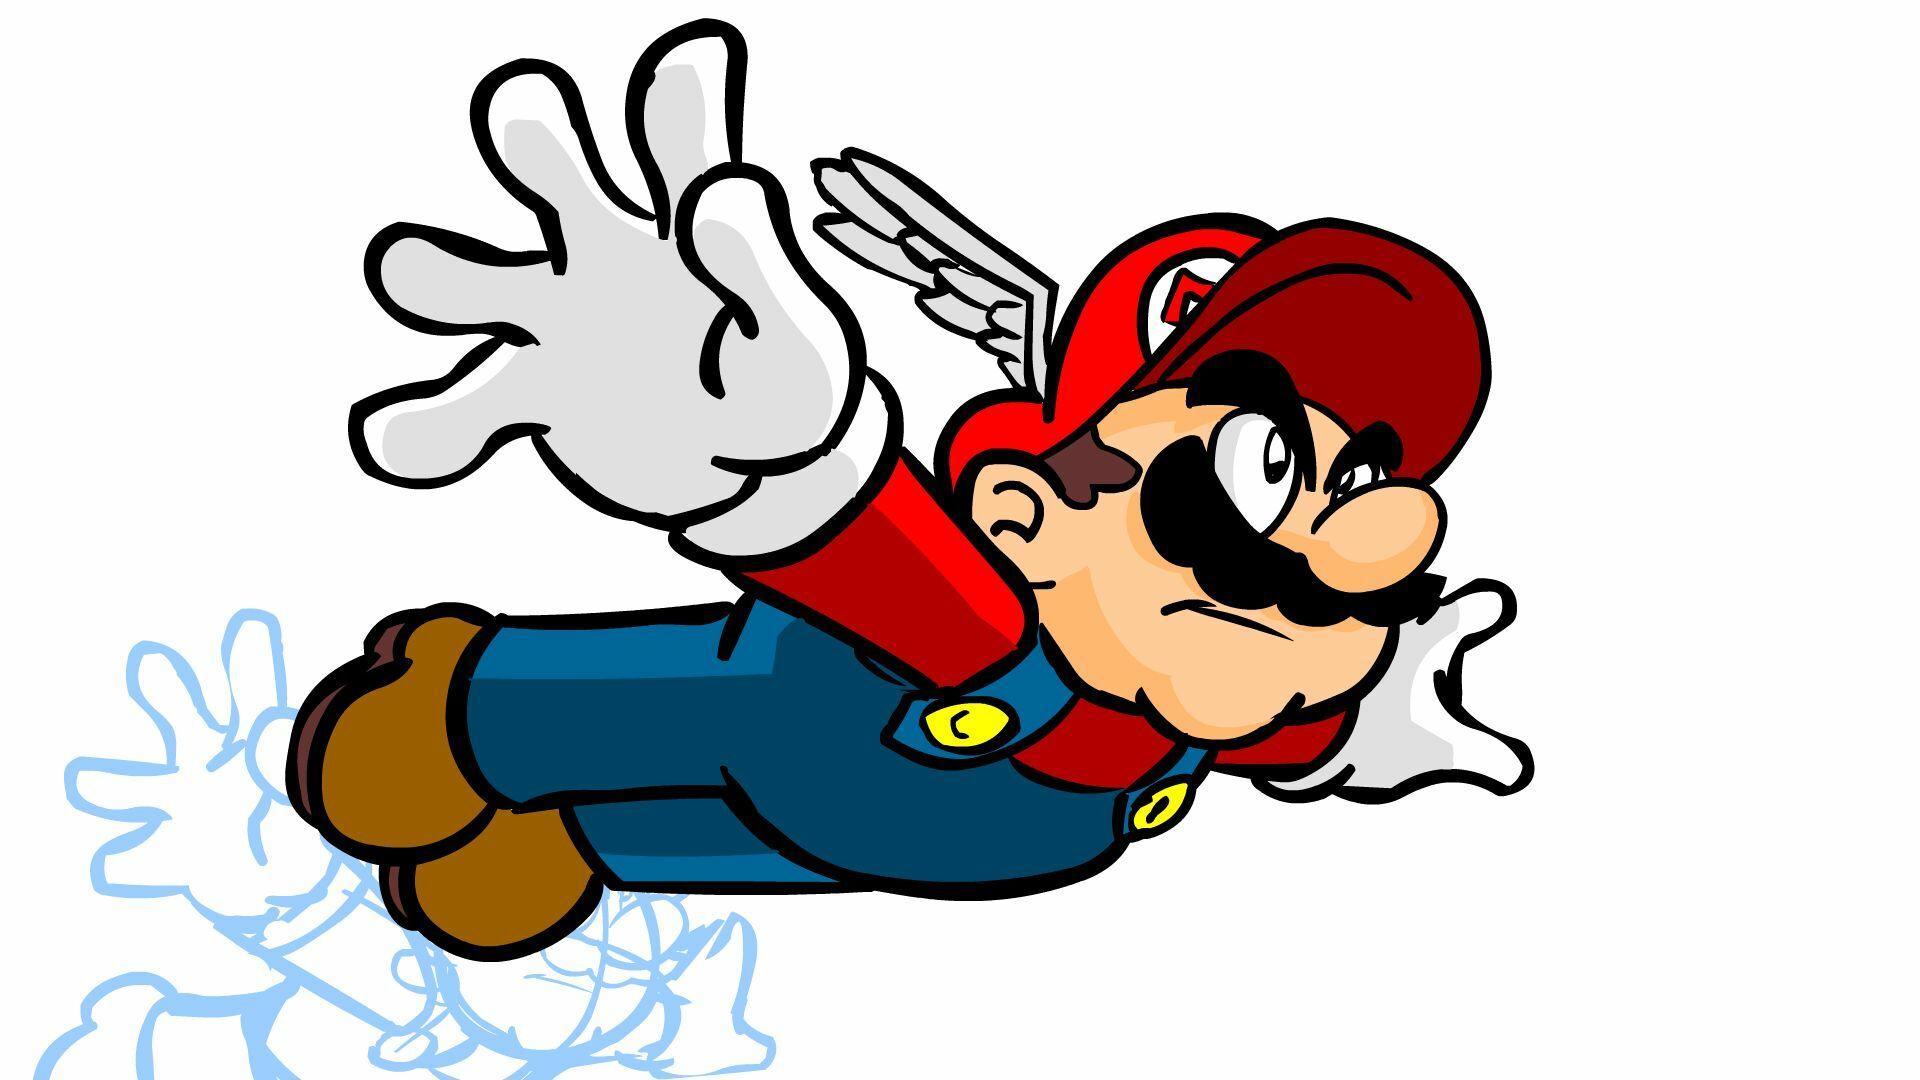 Wing Cap Mario